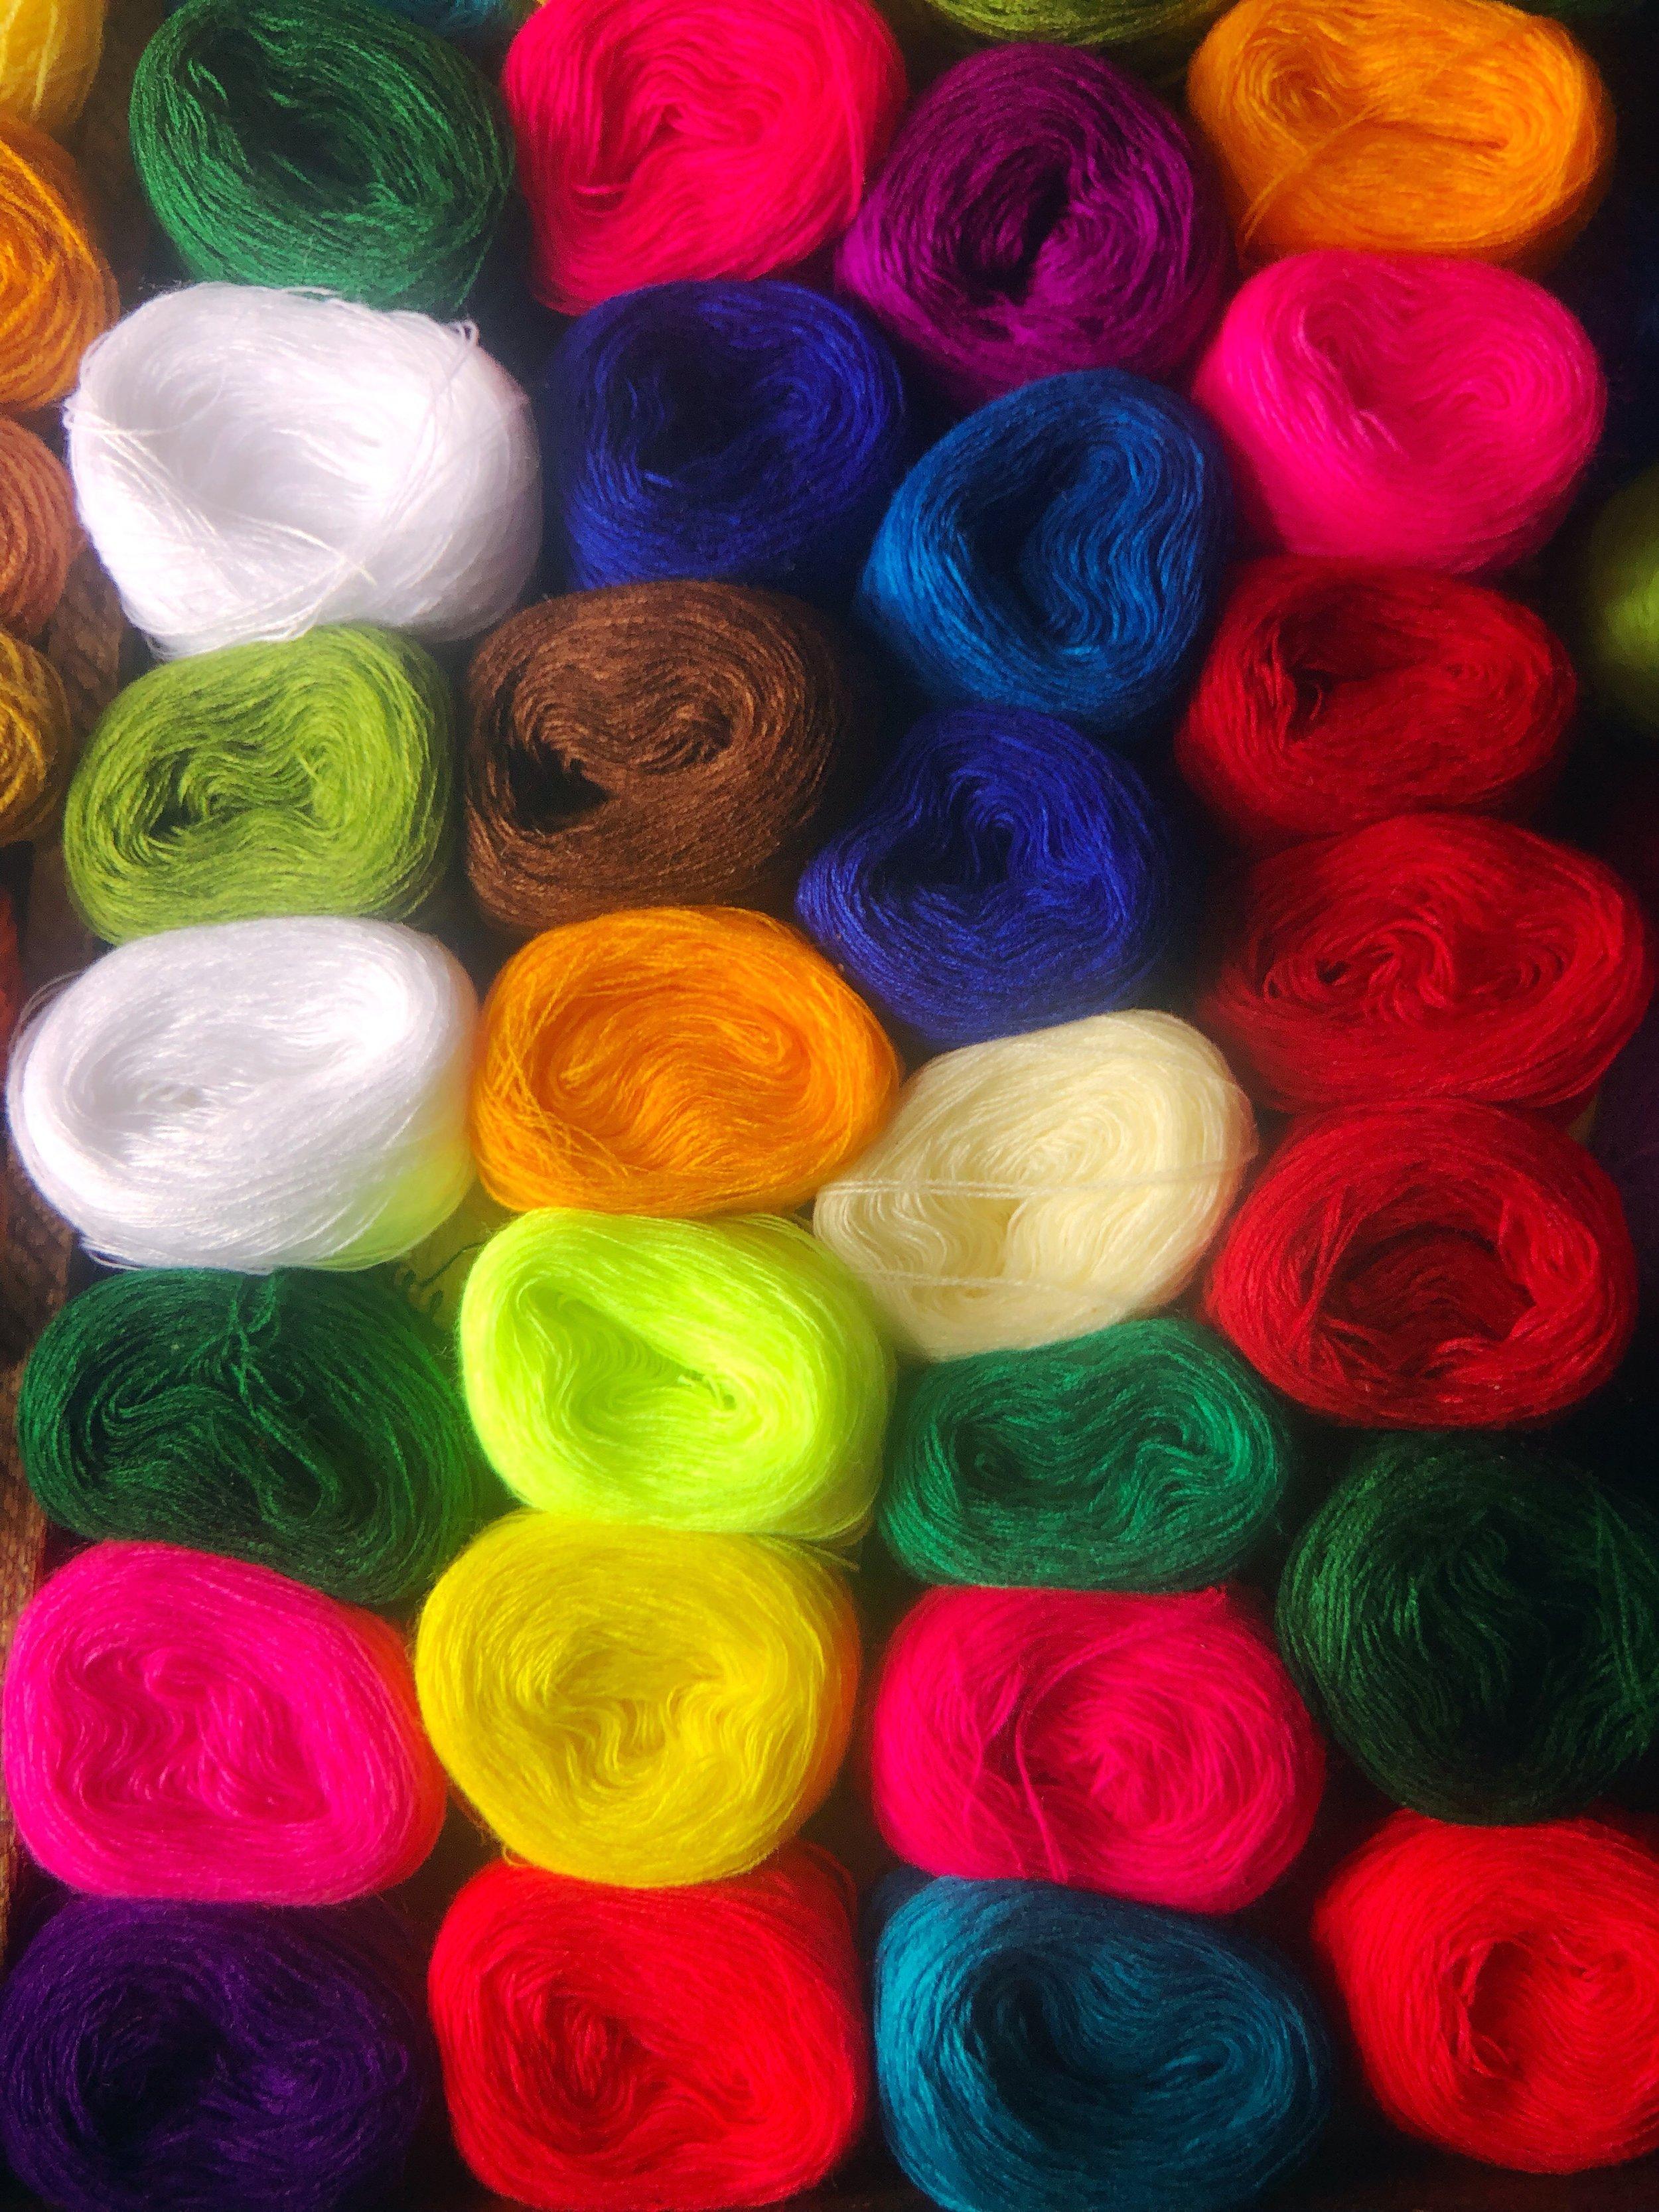 san pedro market-cusco-peru-shopping-food-textiles-south america- travel tips-3